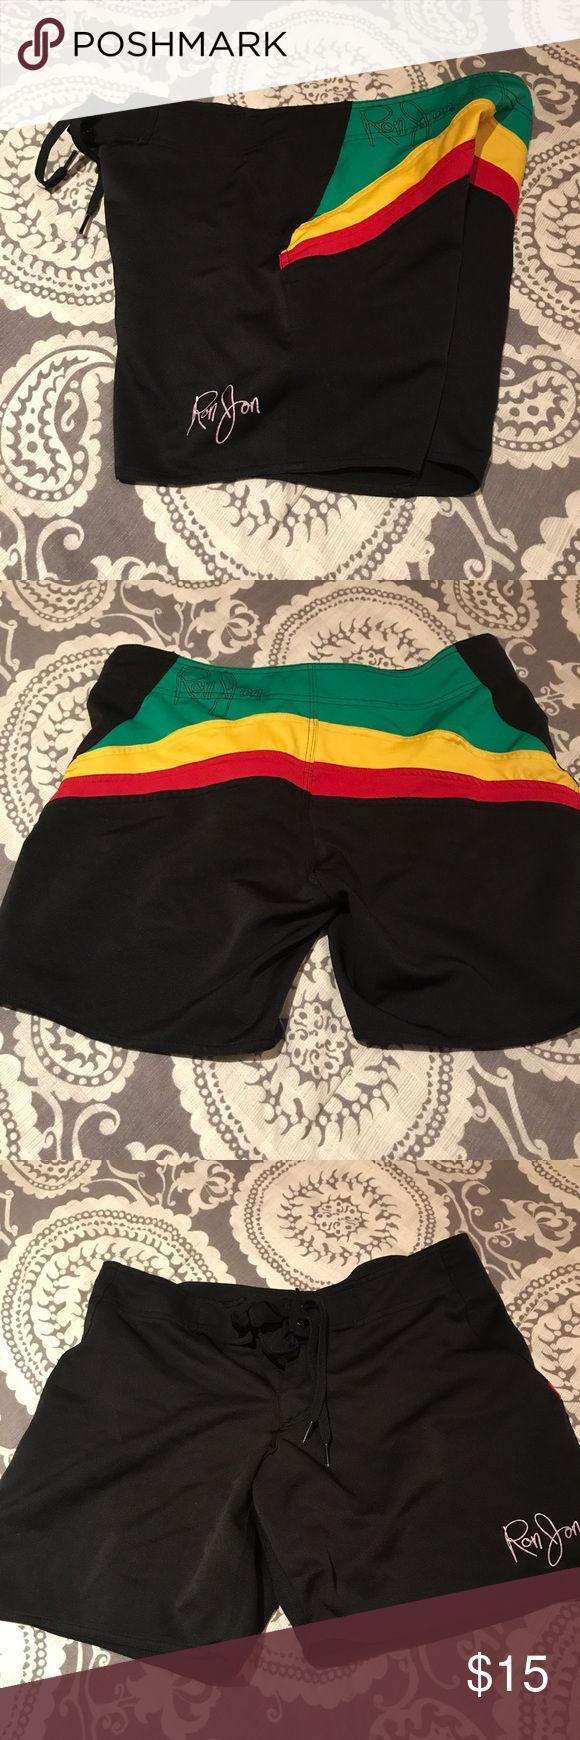 Ron Jon Rasta swim shorts  excellent condition size 5 Ron jon surf shop swim trunks ron jon surf shop Swim